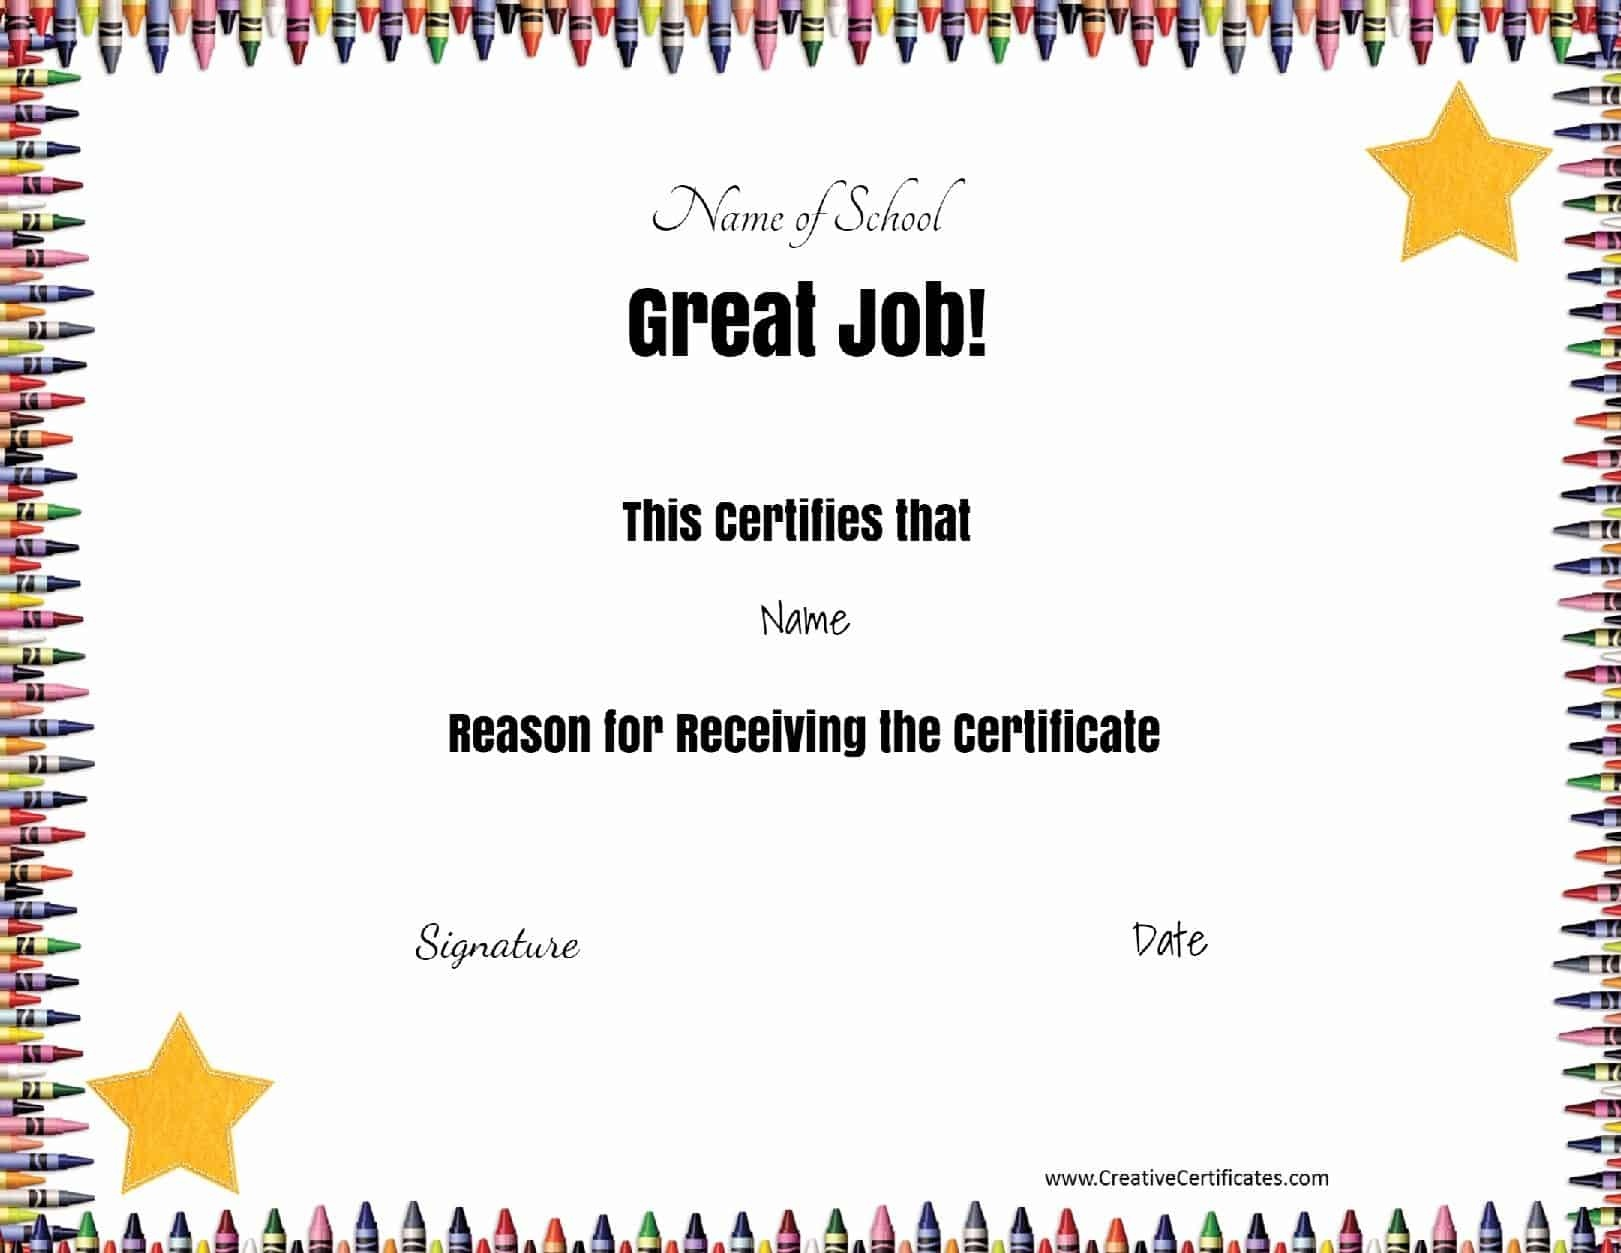 Free School Certificates & Awards - Free Printable School Achievement Certificates